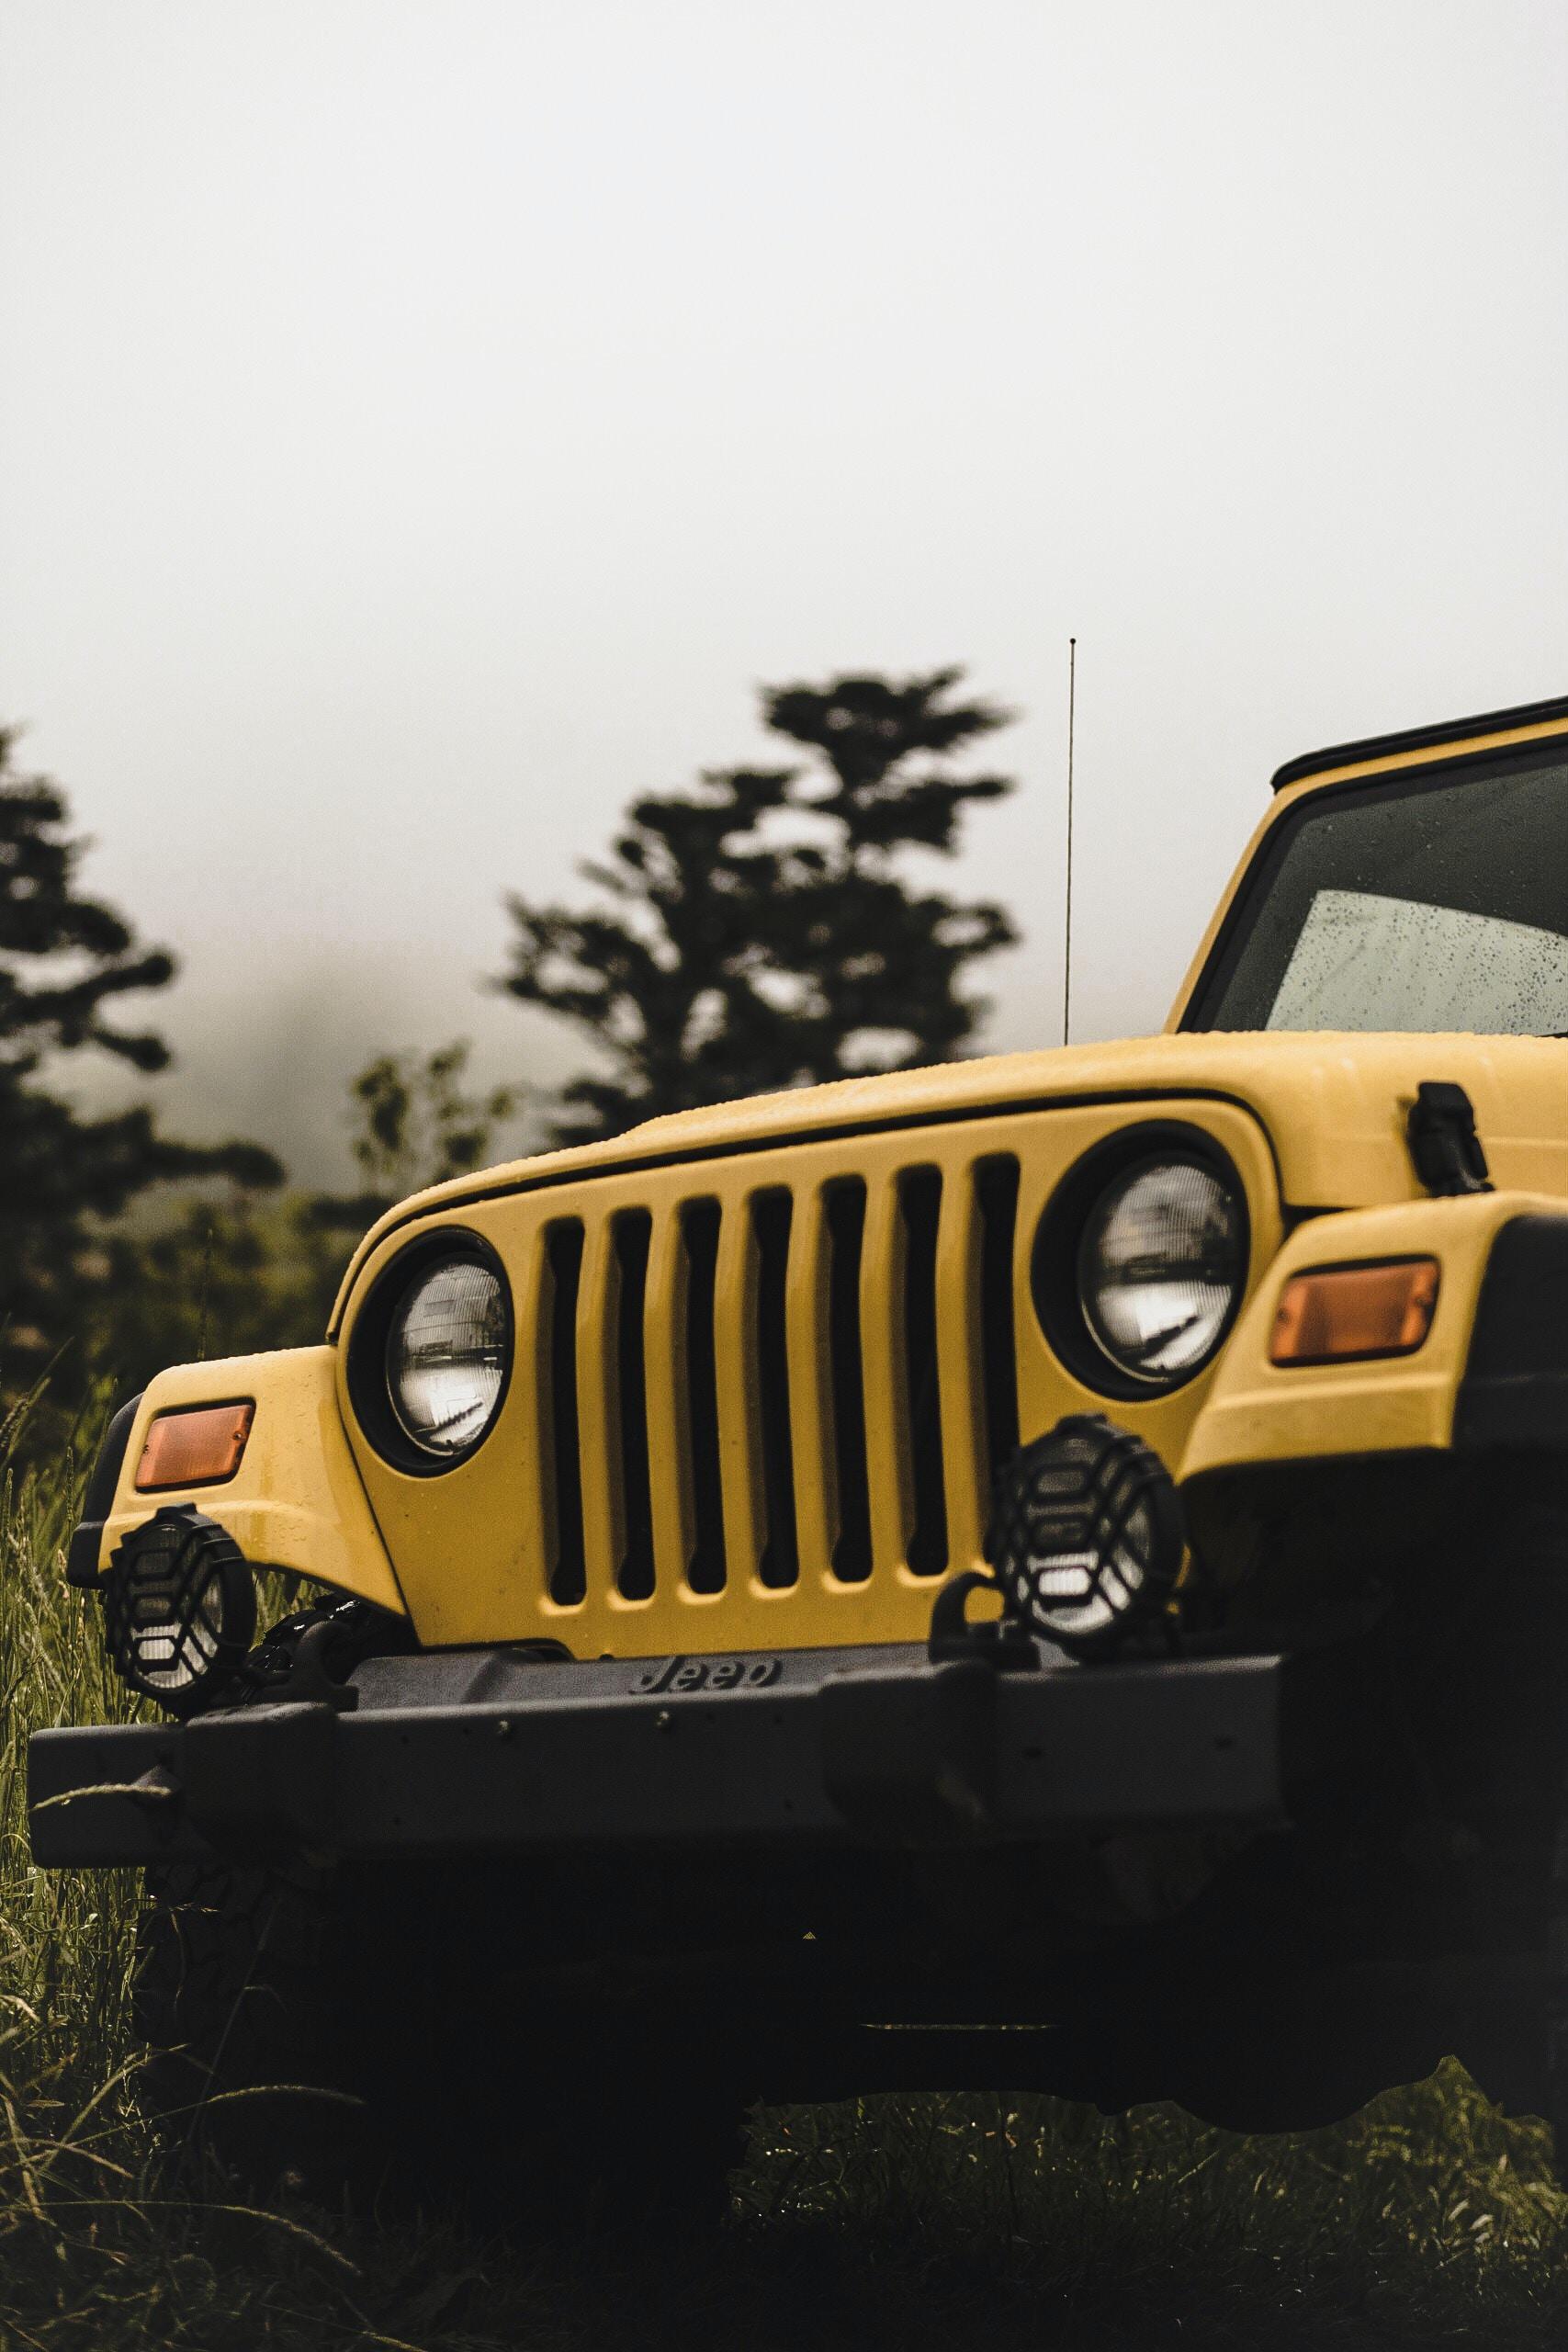 selective focus photography of yellow Jeep Wrangler SUV